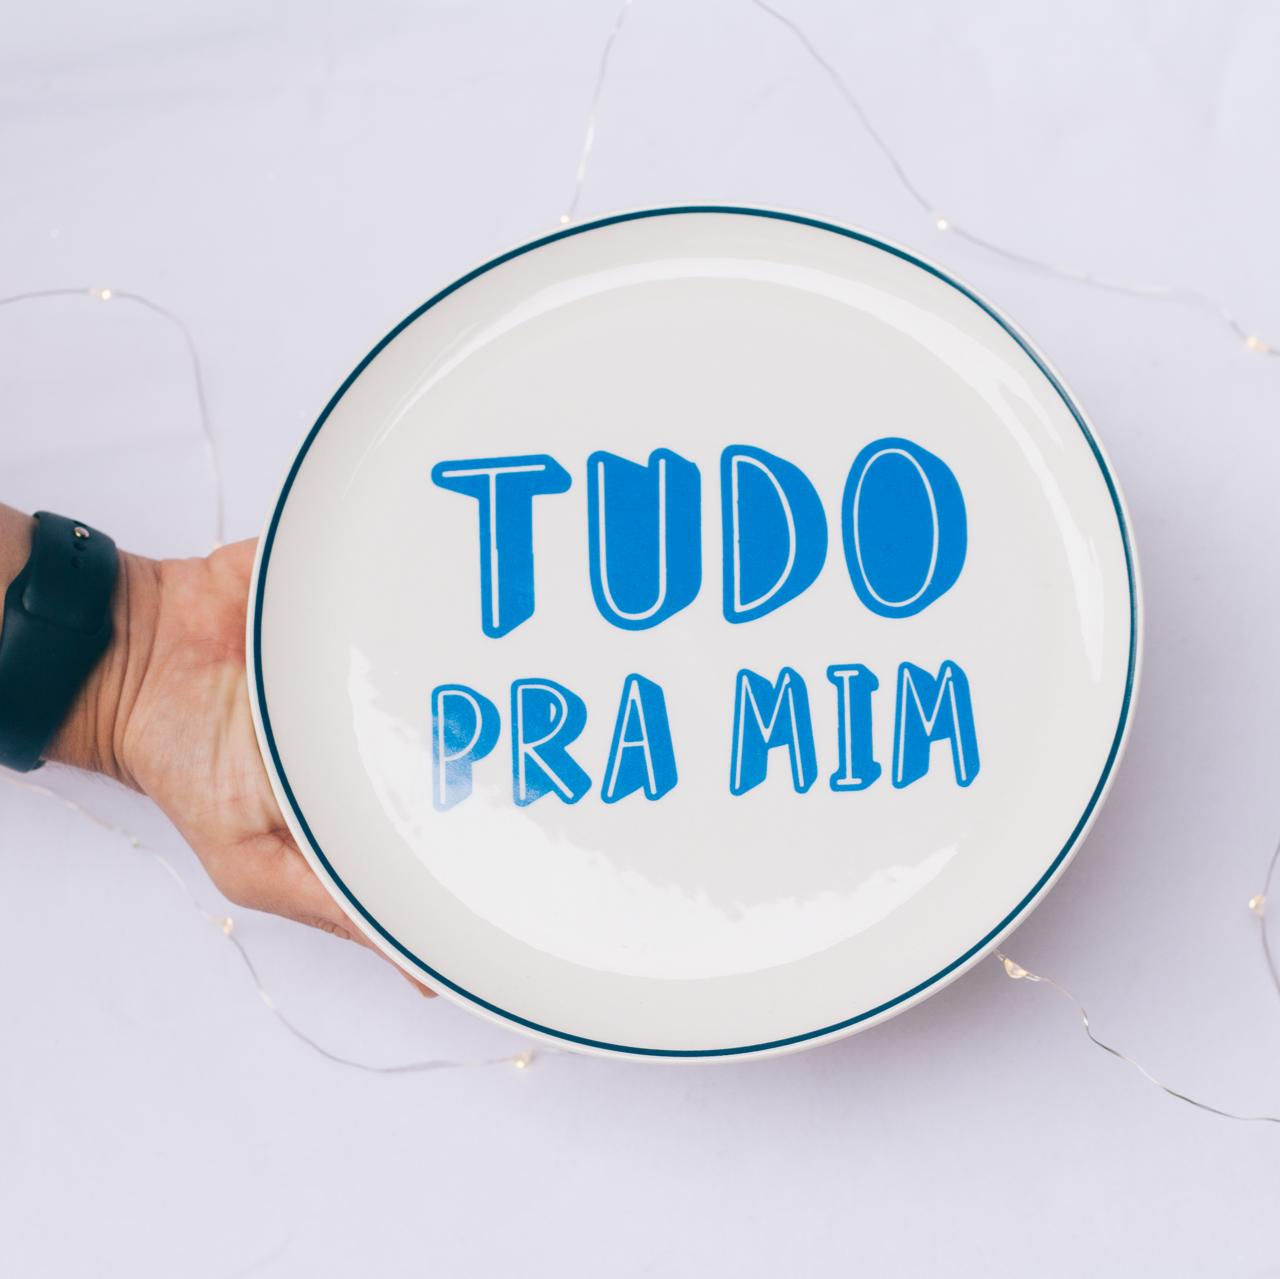 PRATO LANCHE TUDO PRA MIM